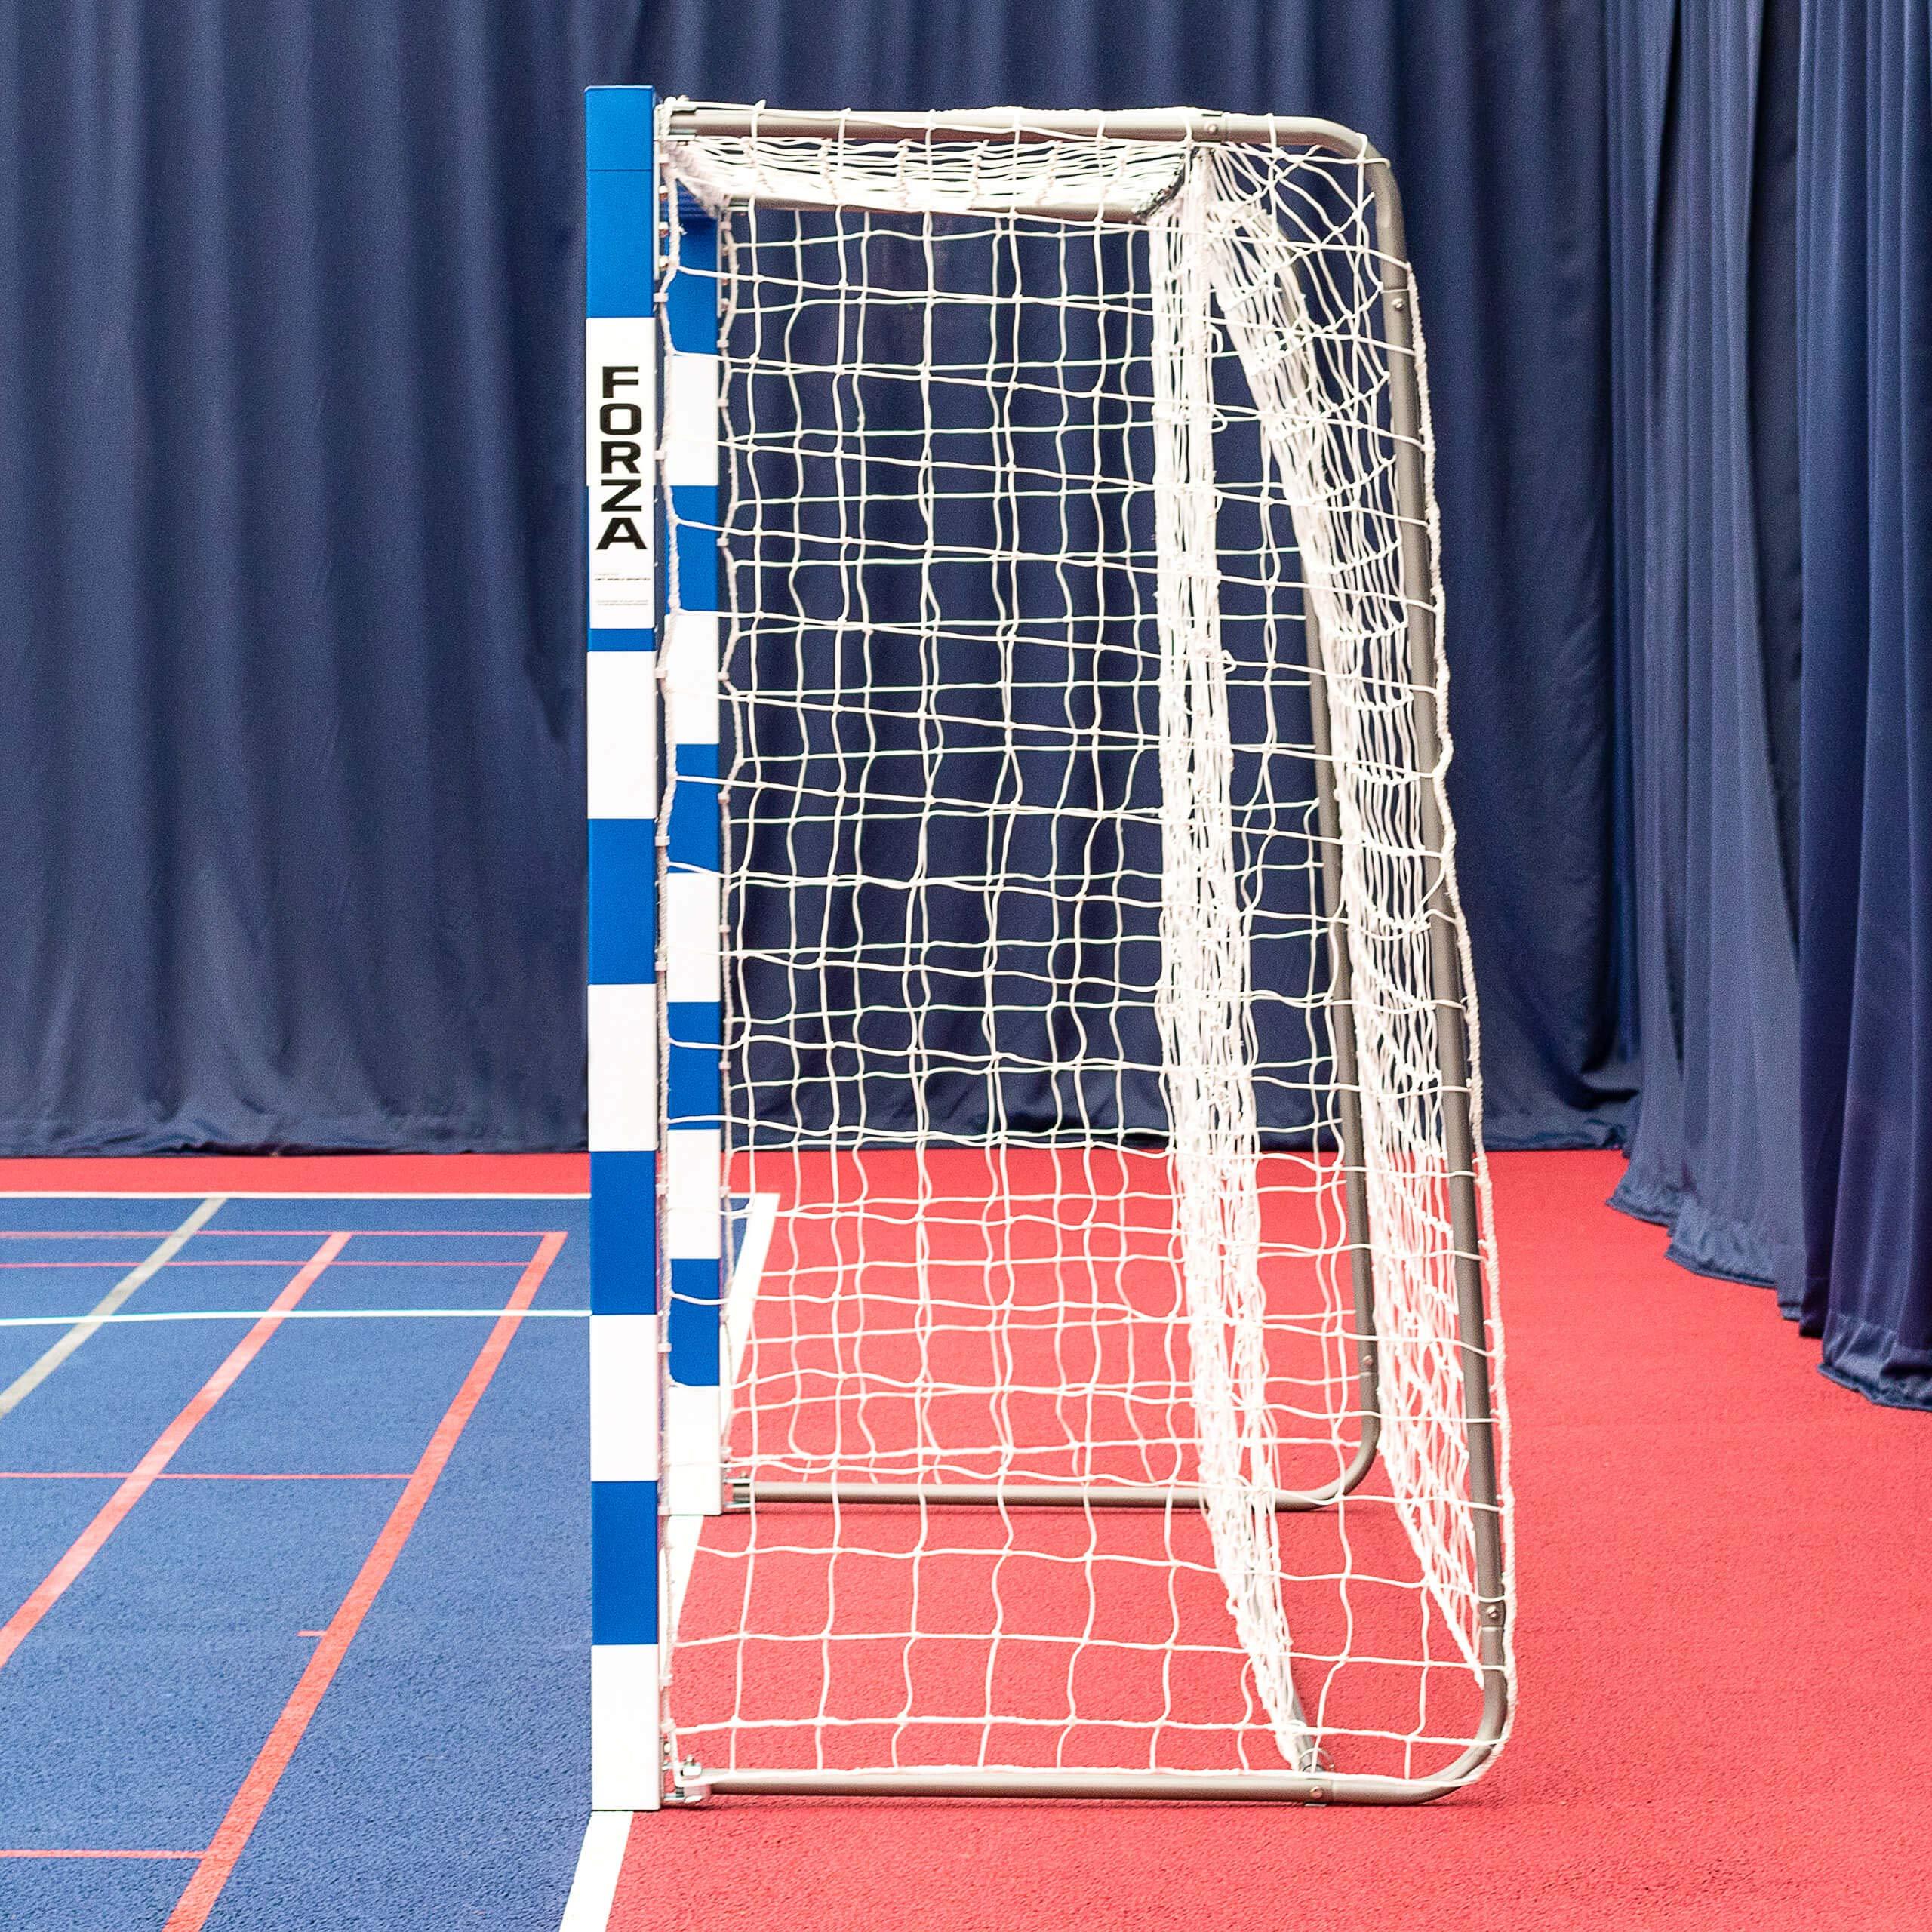 Forza Alu80 Competition Handball Goals   IHF Regulation Size 3m x 2m Handball Goal [Net World Sports] (Pair, Blue) by Forza (Image #3)